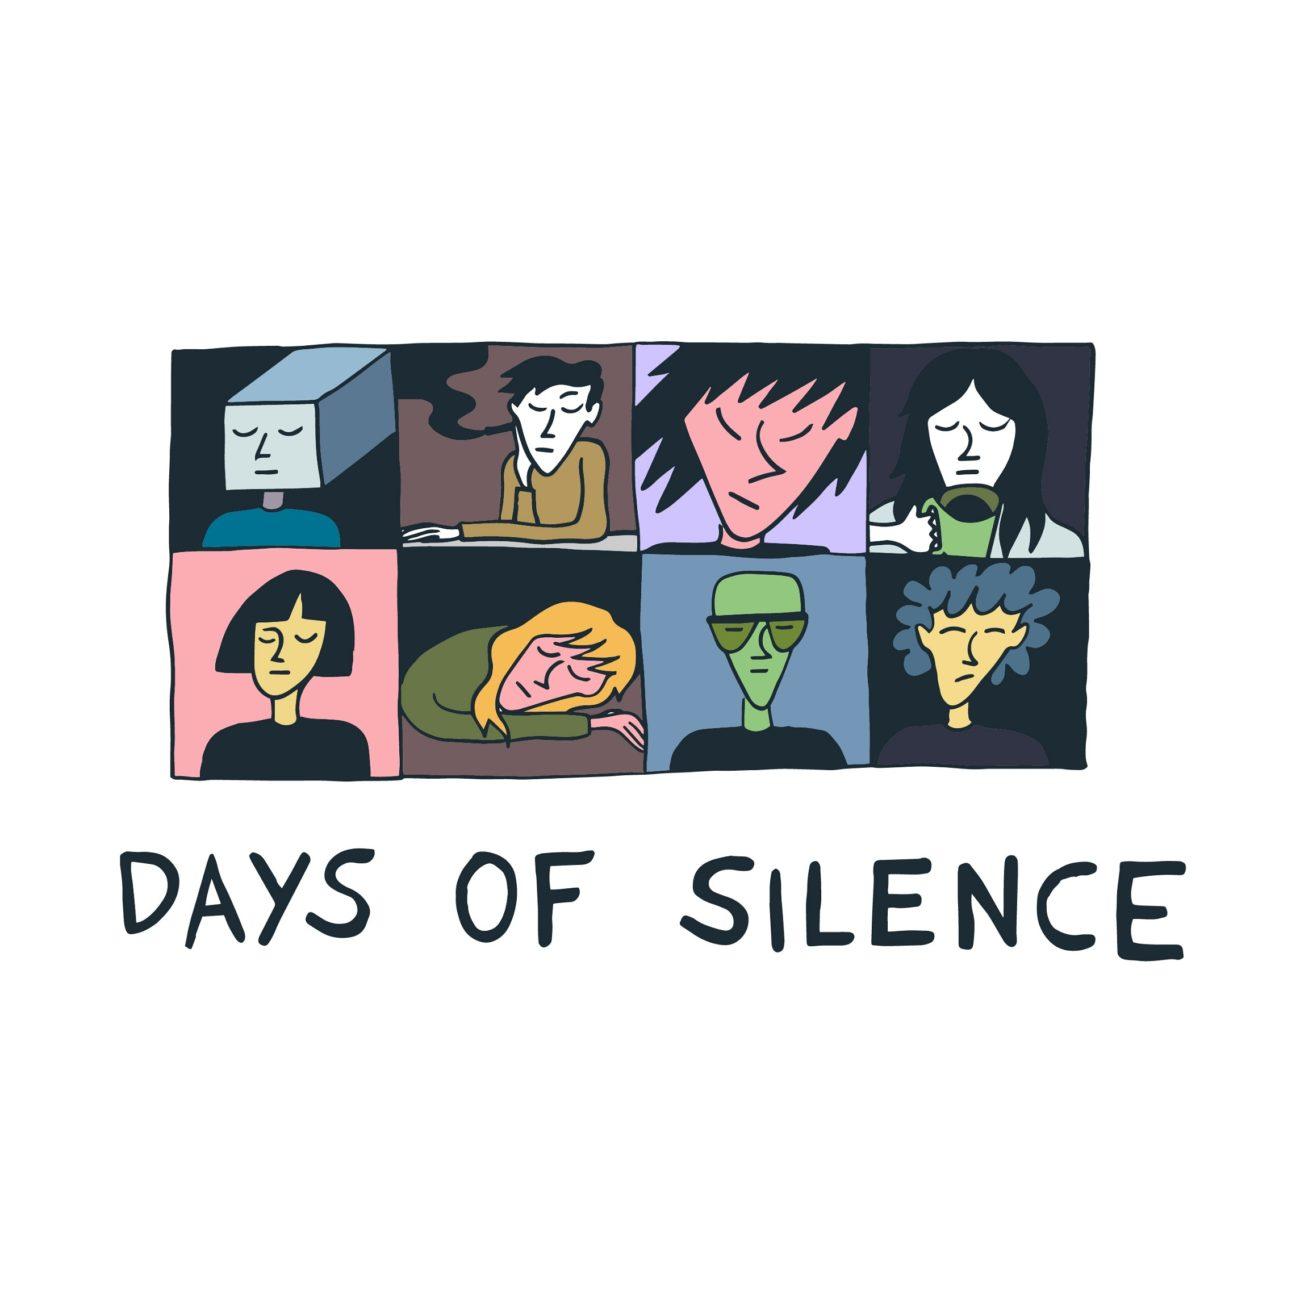 Days of silence